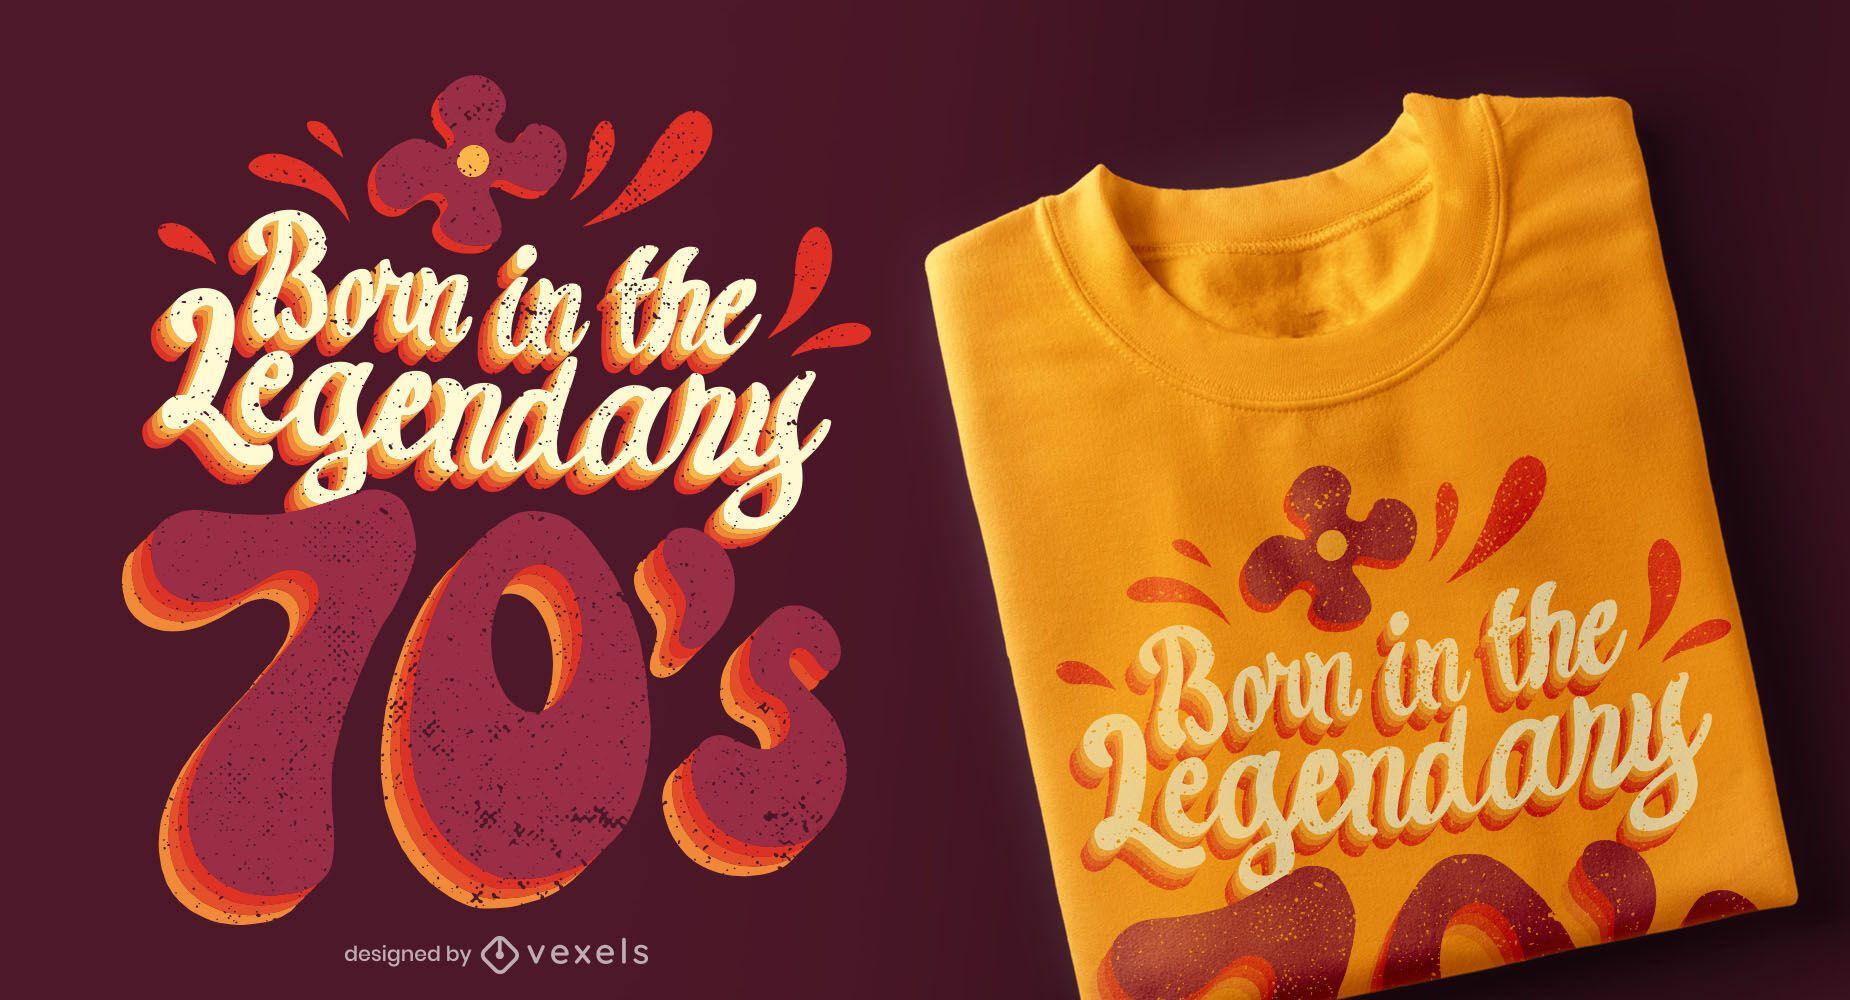 Legendary 70s T-shirt Design